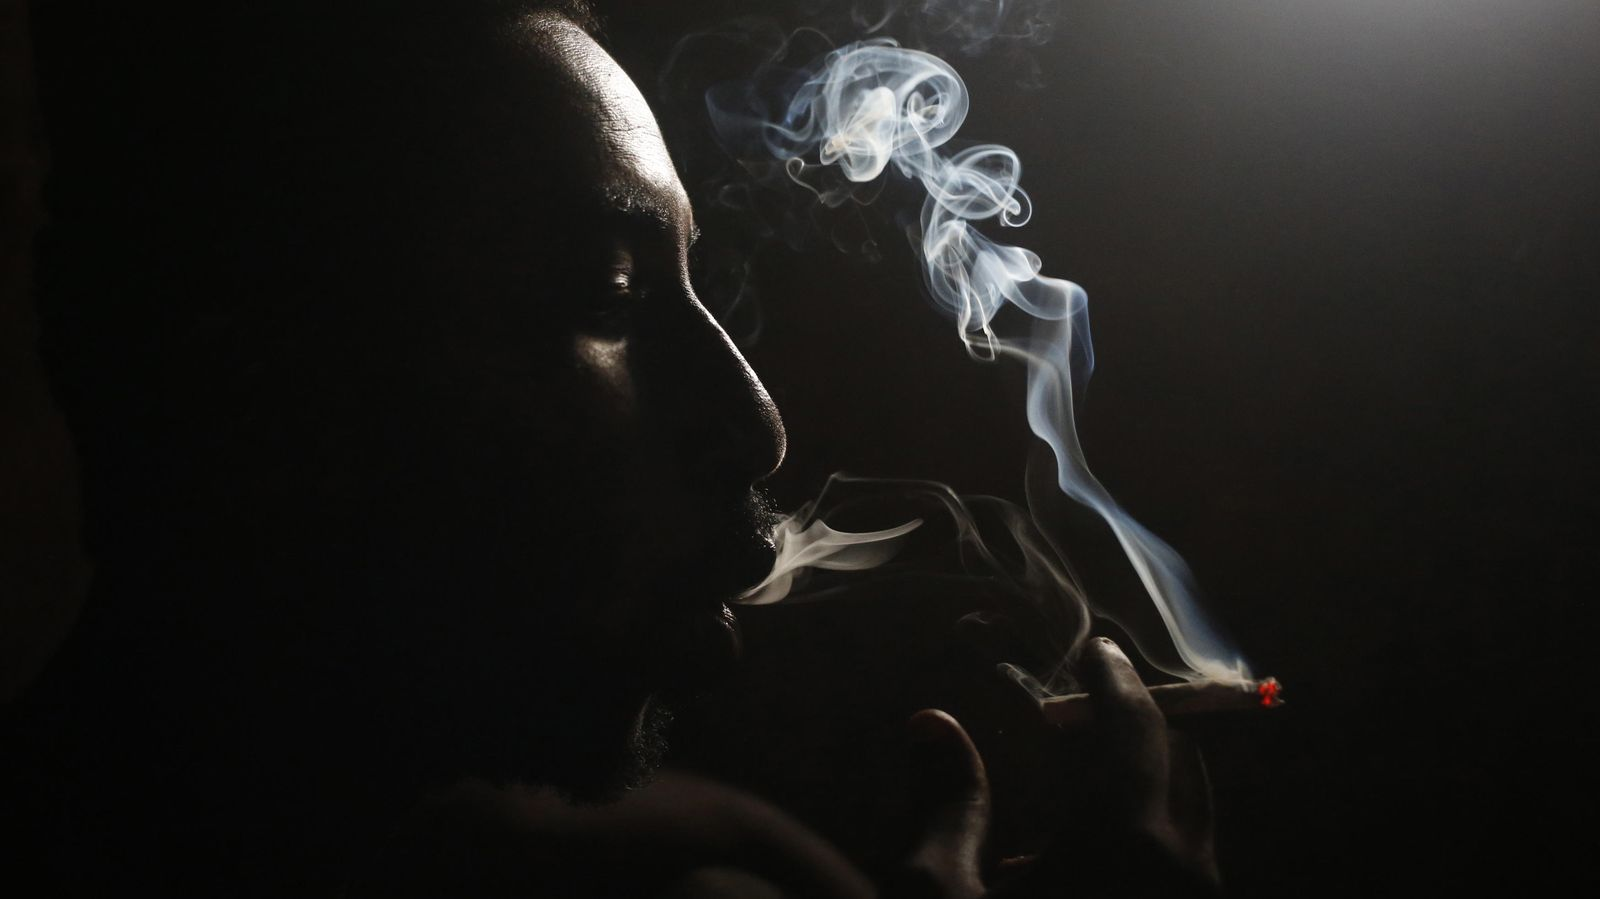 Foto: Un heroinómano fuma en Lamu (Kenia) en noviembre de 2014. (Reuters/Goran Tomasevic)